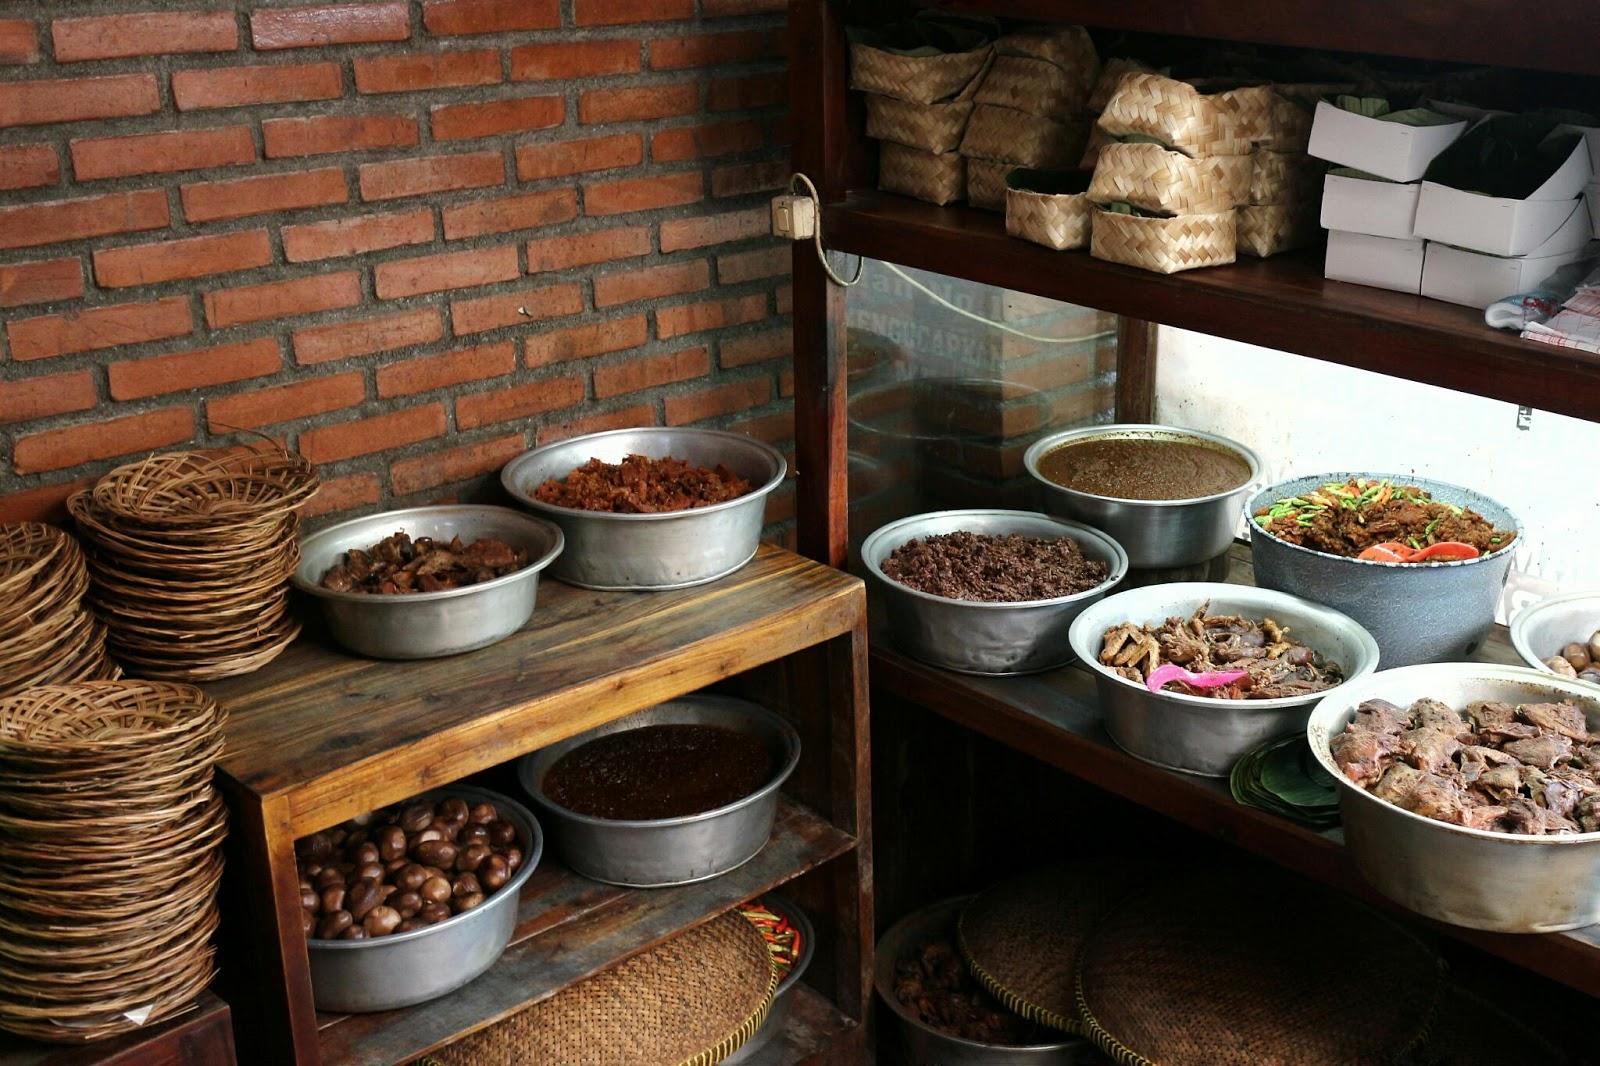 Kuliner Gudeg Jogja Yang Wajib Dikunjungi 1001malam